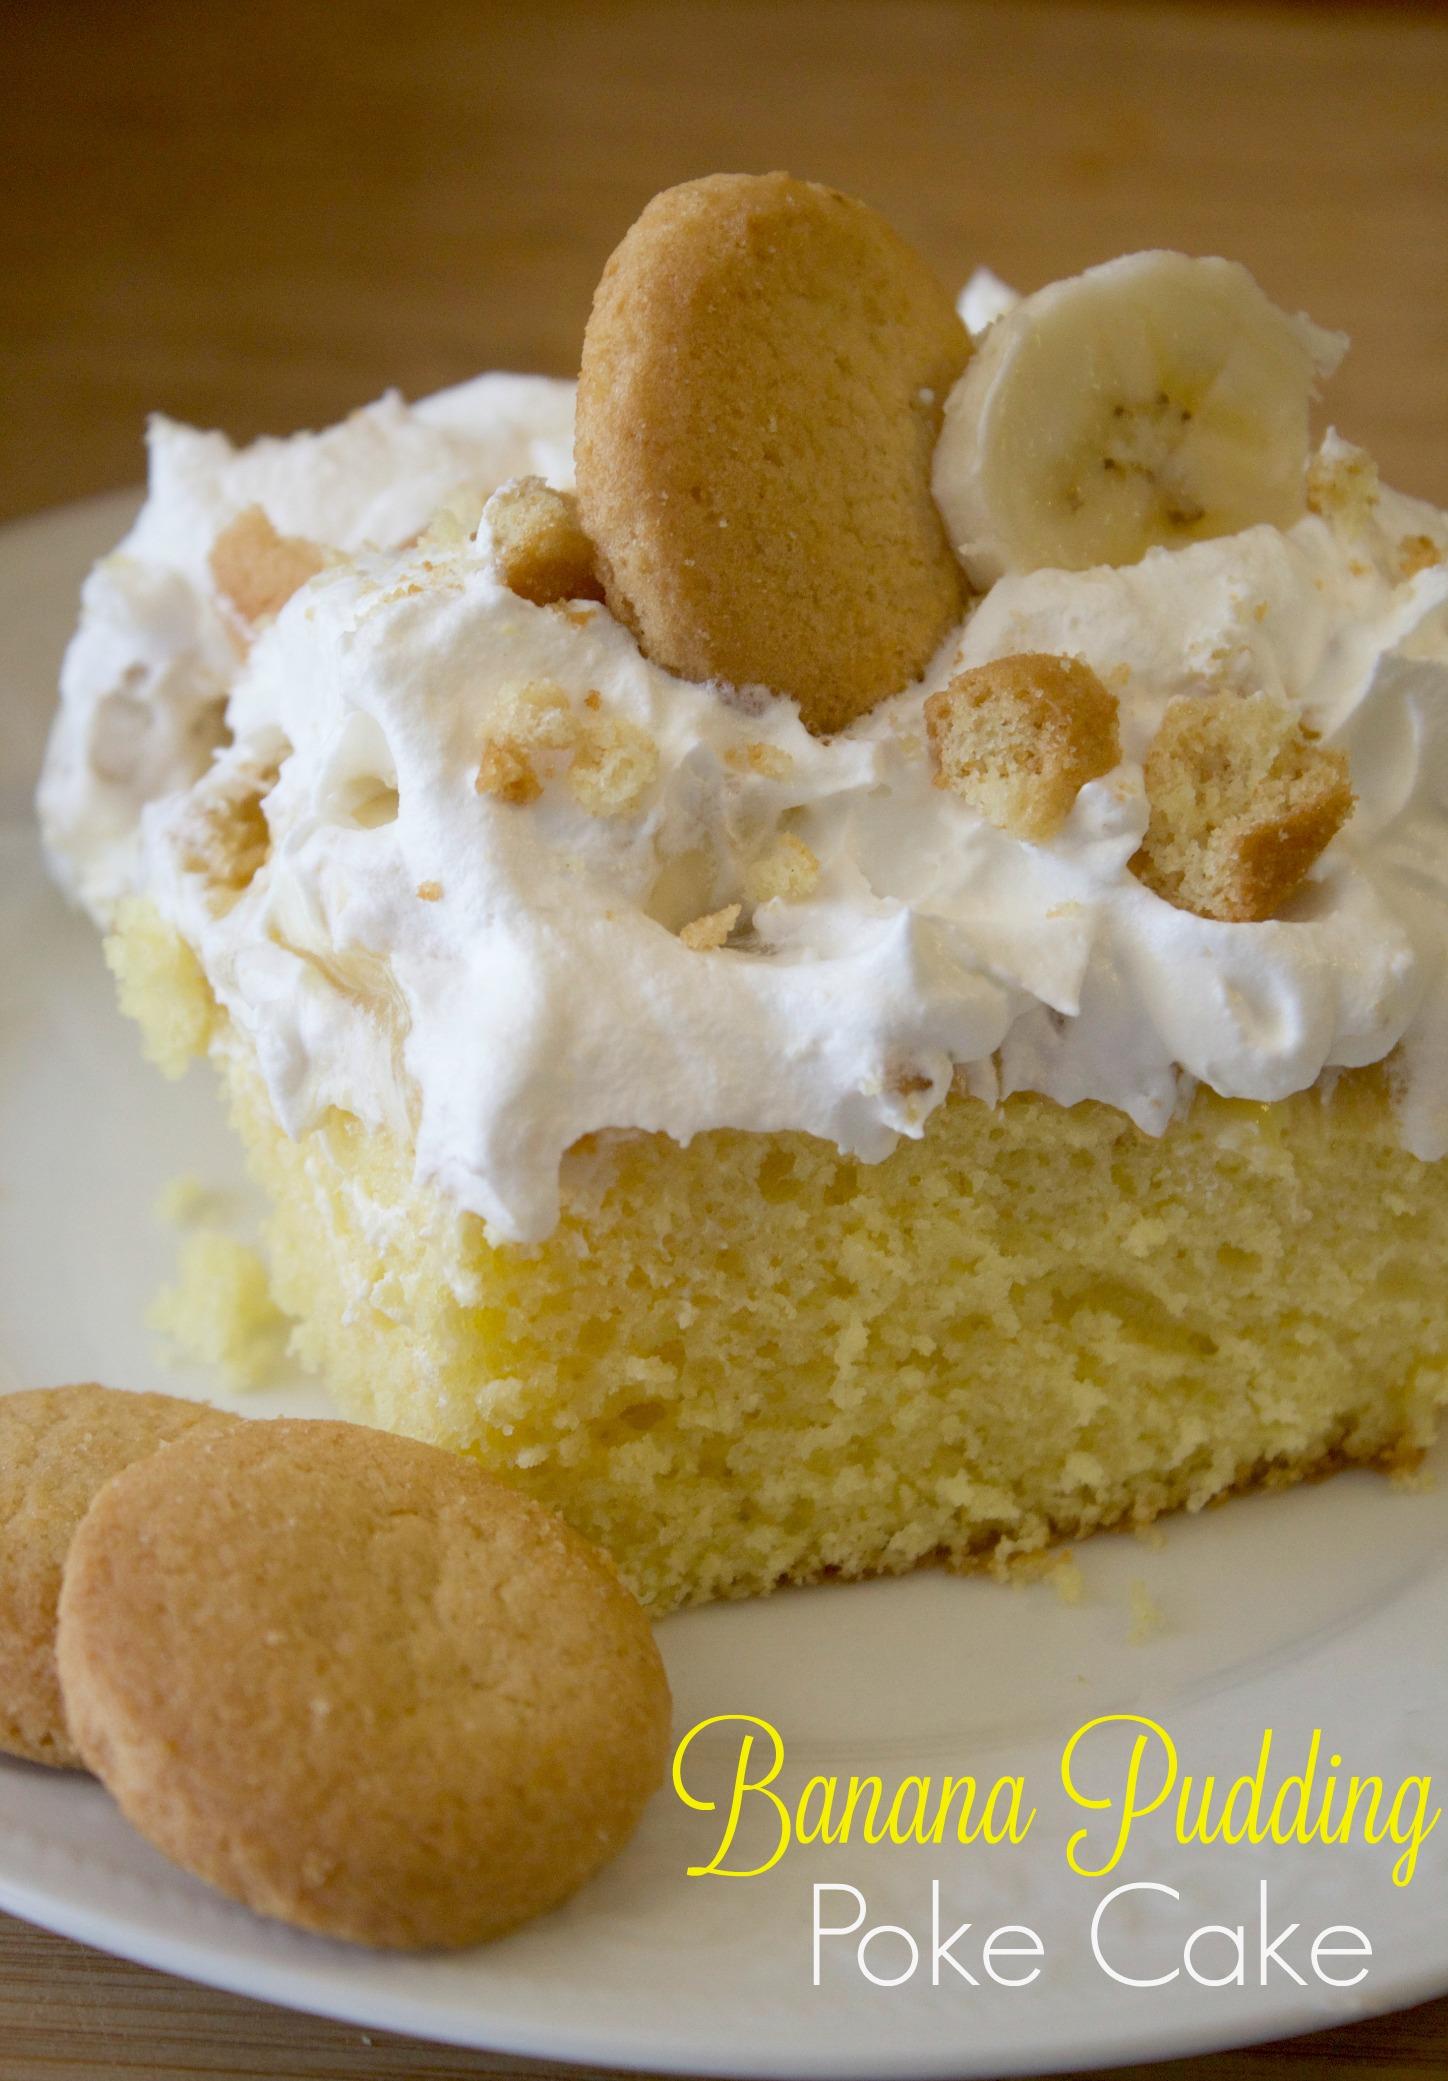 The Best Banana Pudding Poke Cake Recipe Every